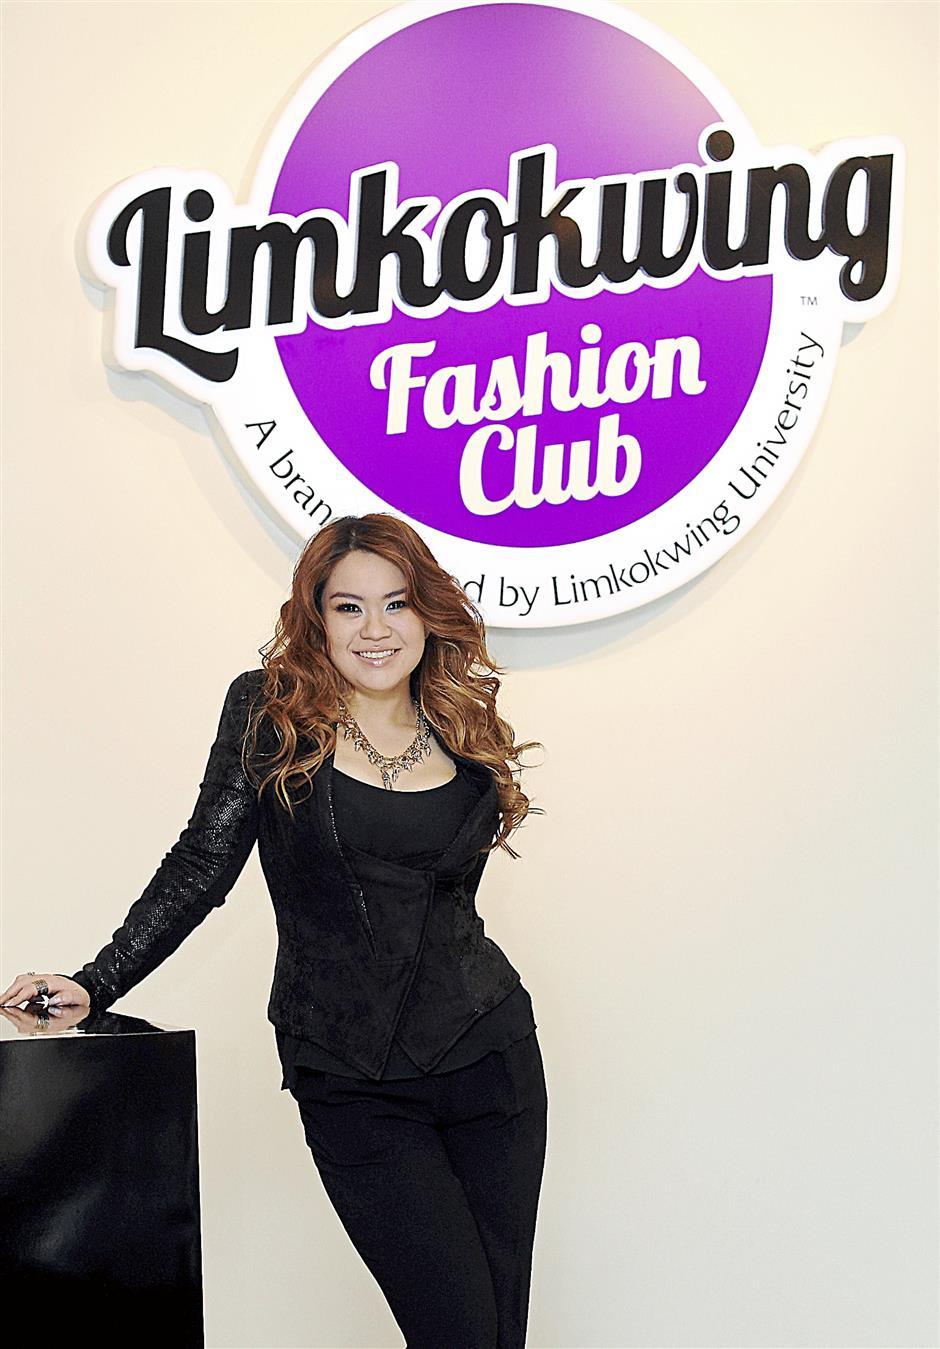 Tiffanee at Limkokwing Fashion Club's boutique at Publika, Solaris Dutamas, Kuala Lumpur.